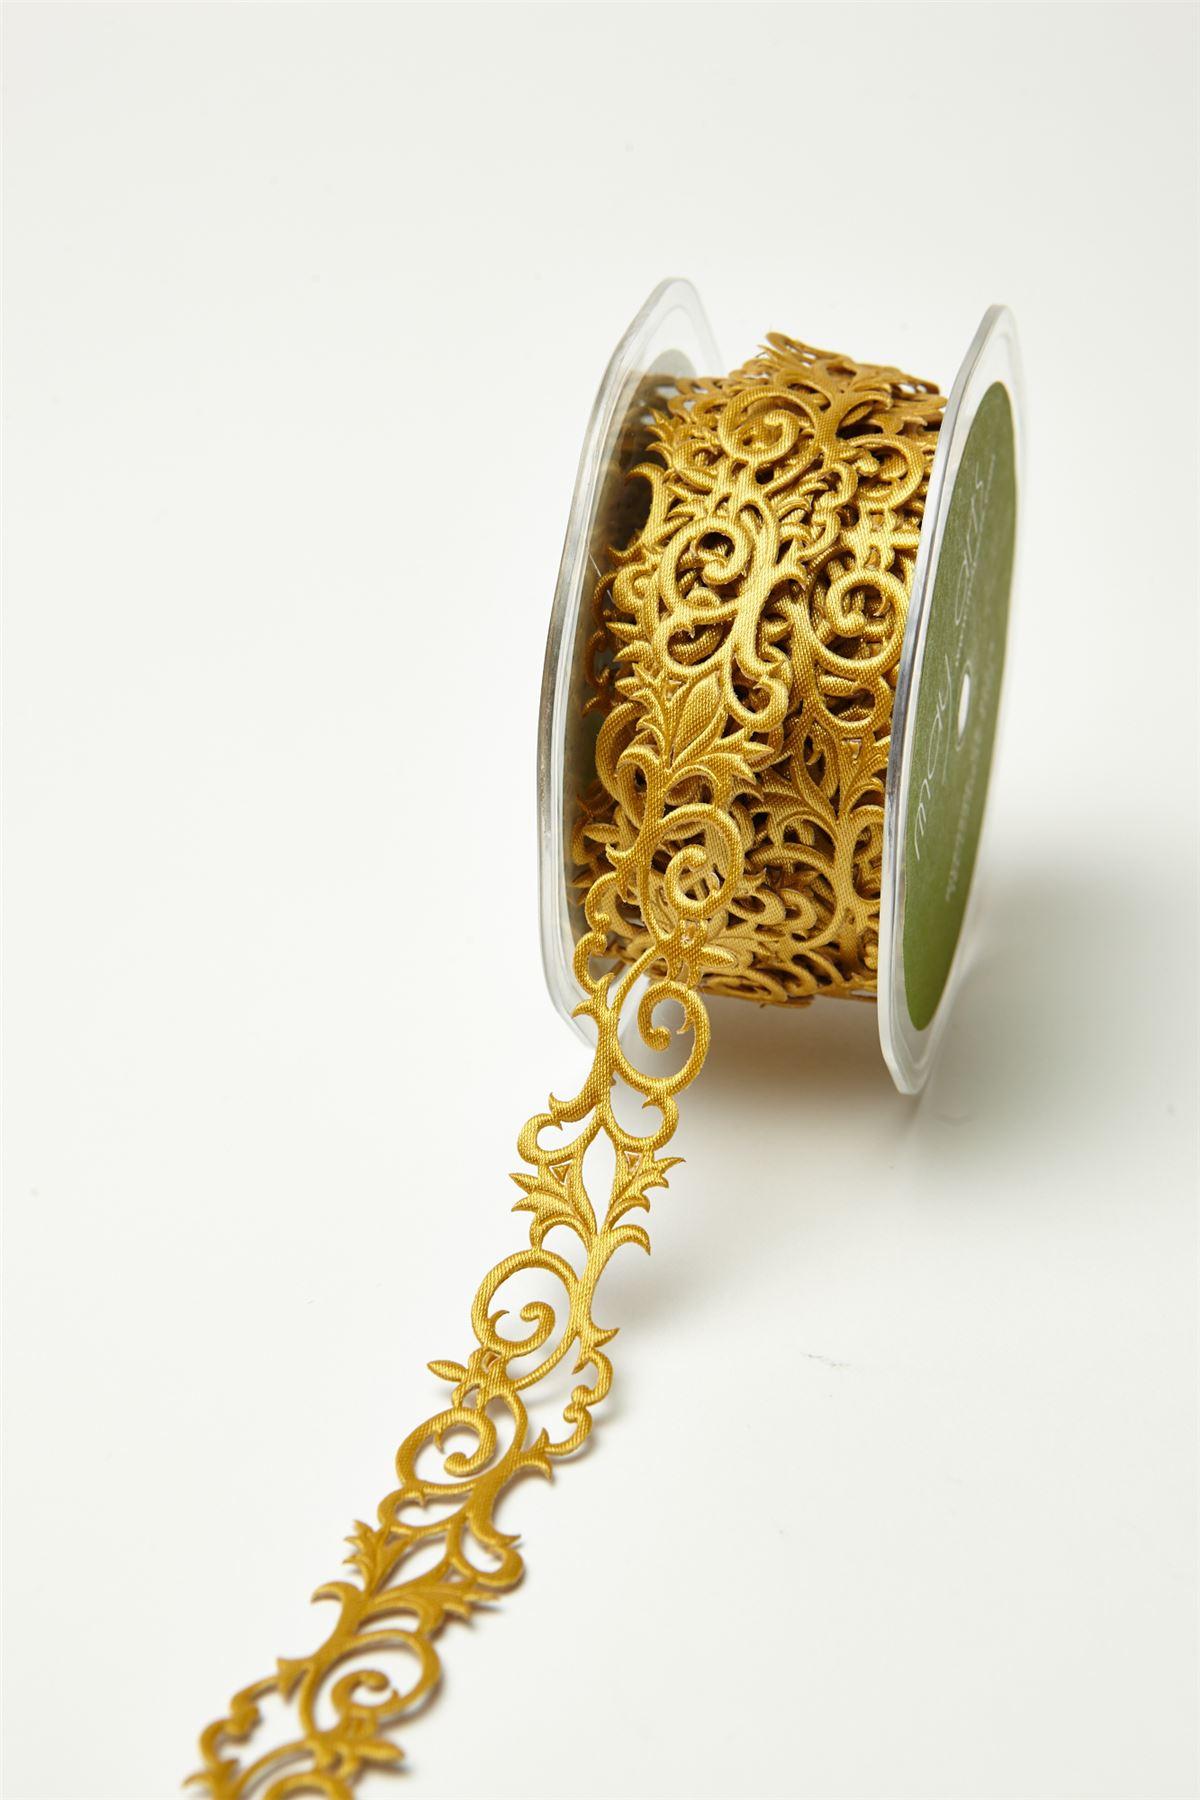 "Adhesive Fleur de lis Scroll Gift Wrap Décor Tape Craft Ribbon 7/8"" Width"